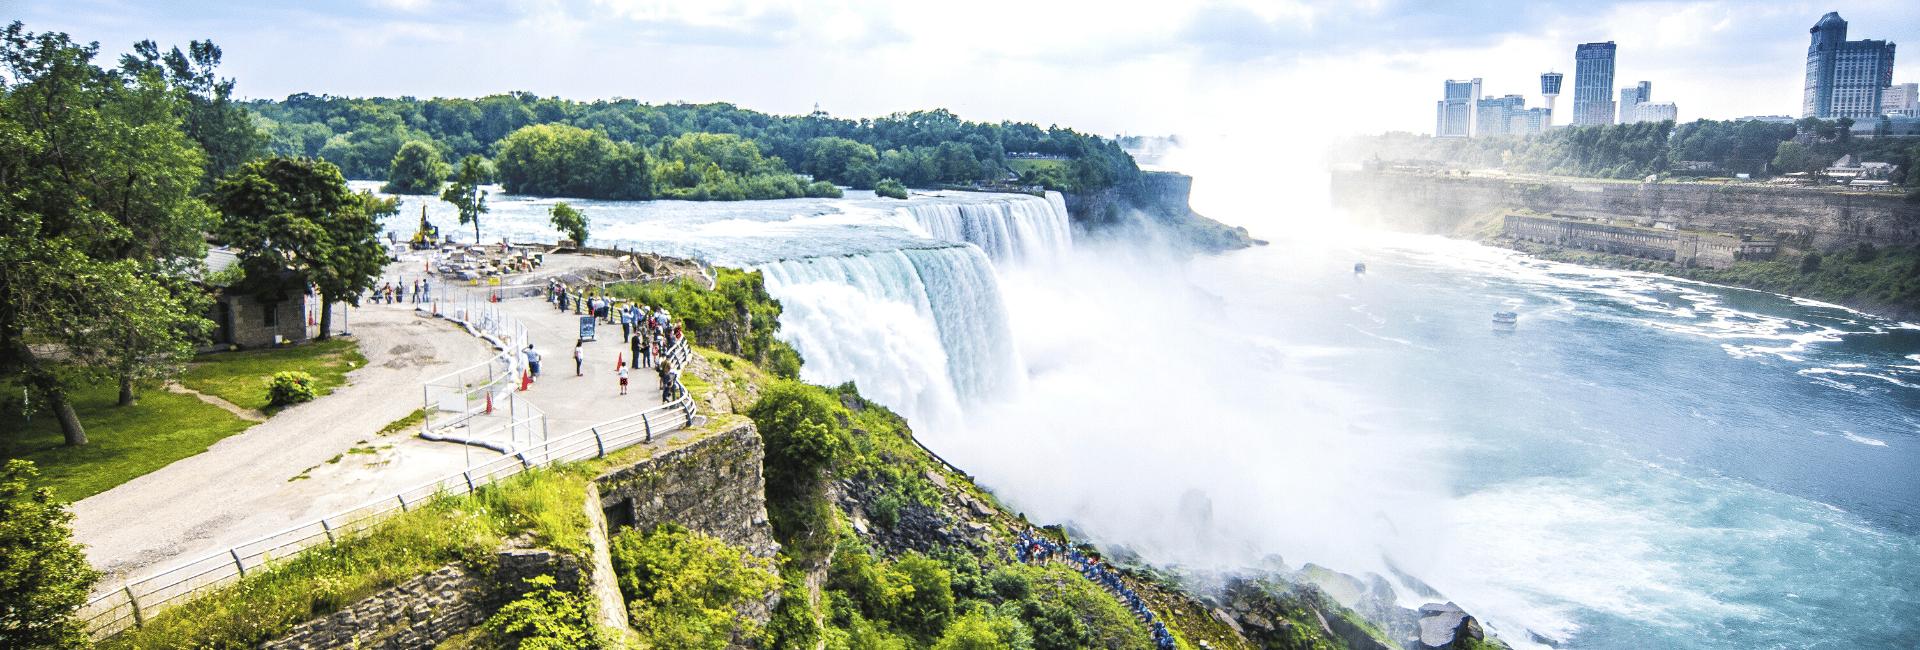 Niagara Falls og Toronto i baggrunden